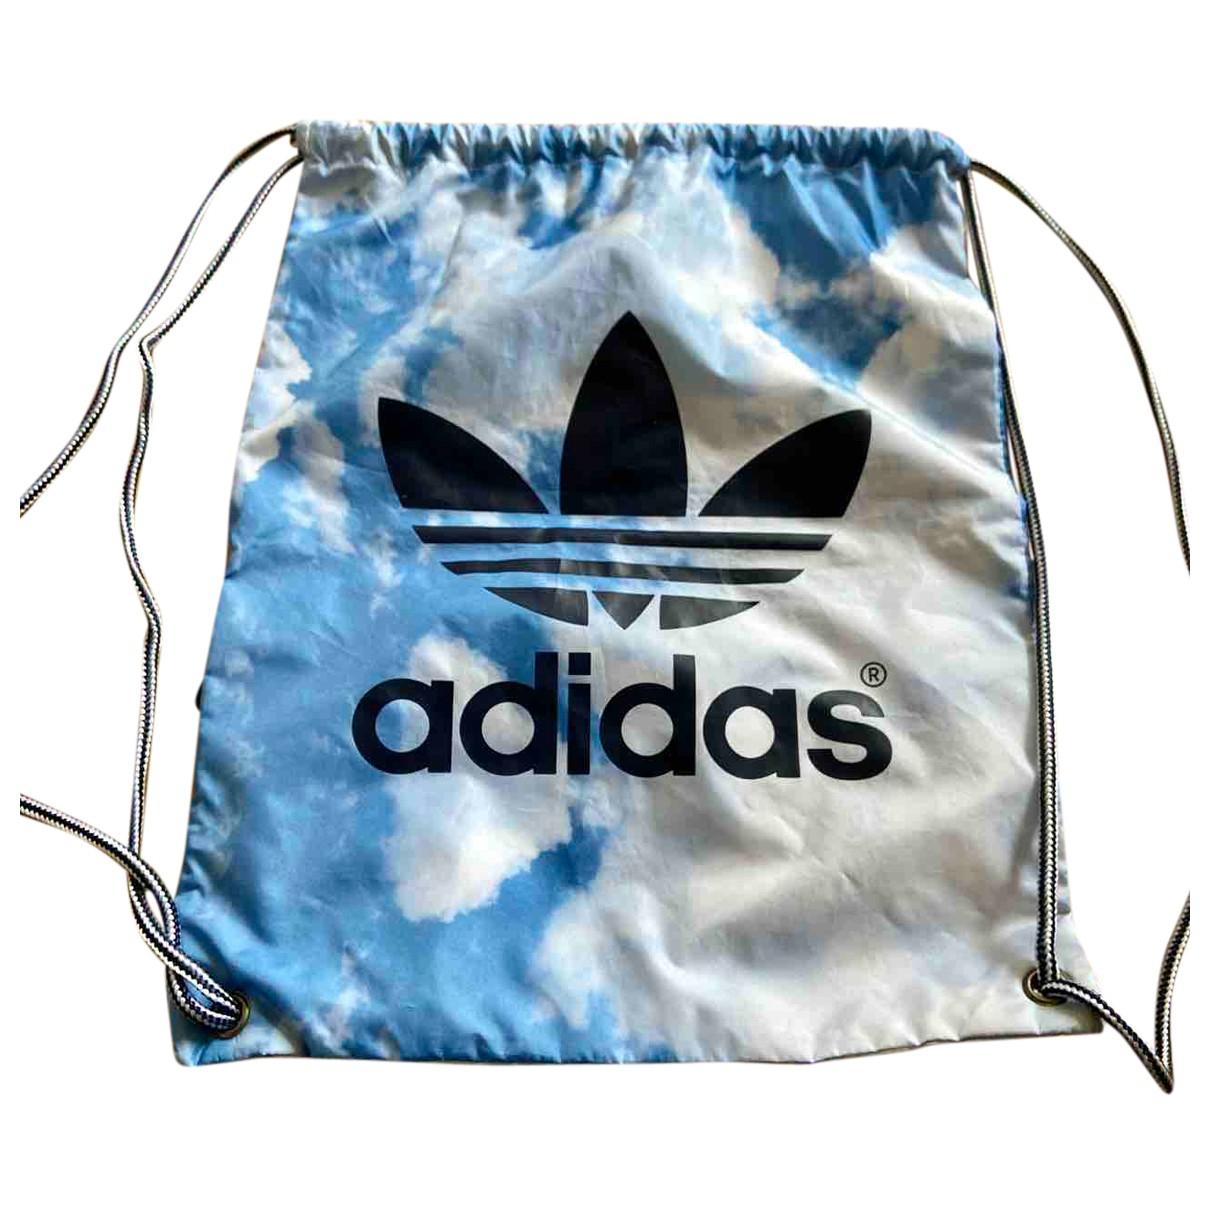 Adidas \N Rucksaecke in  Weiss Polyester